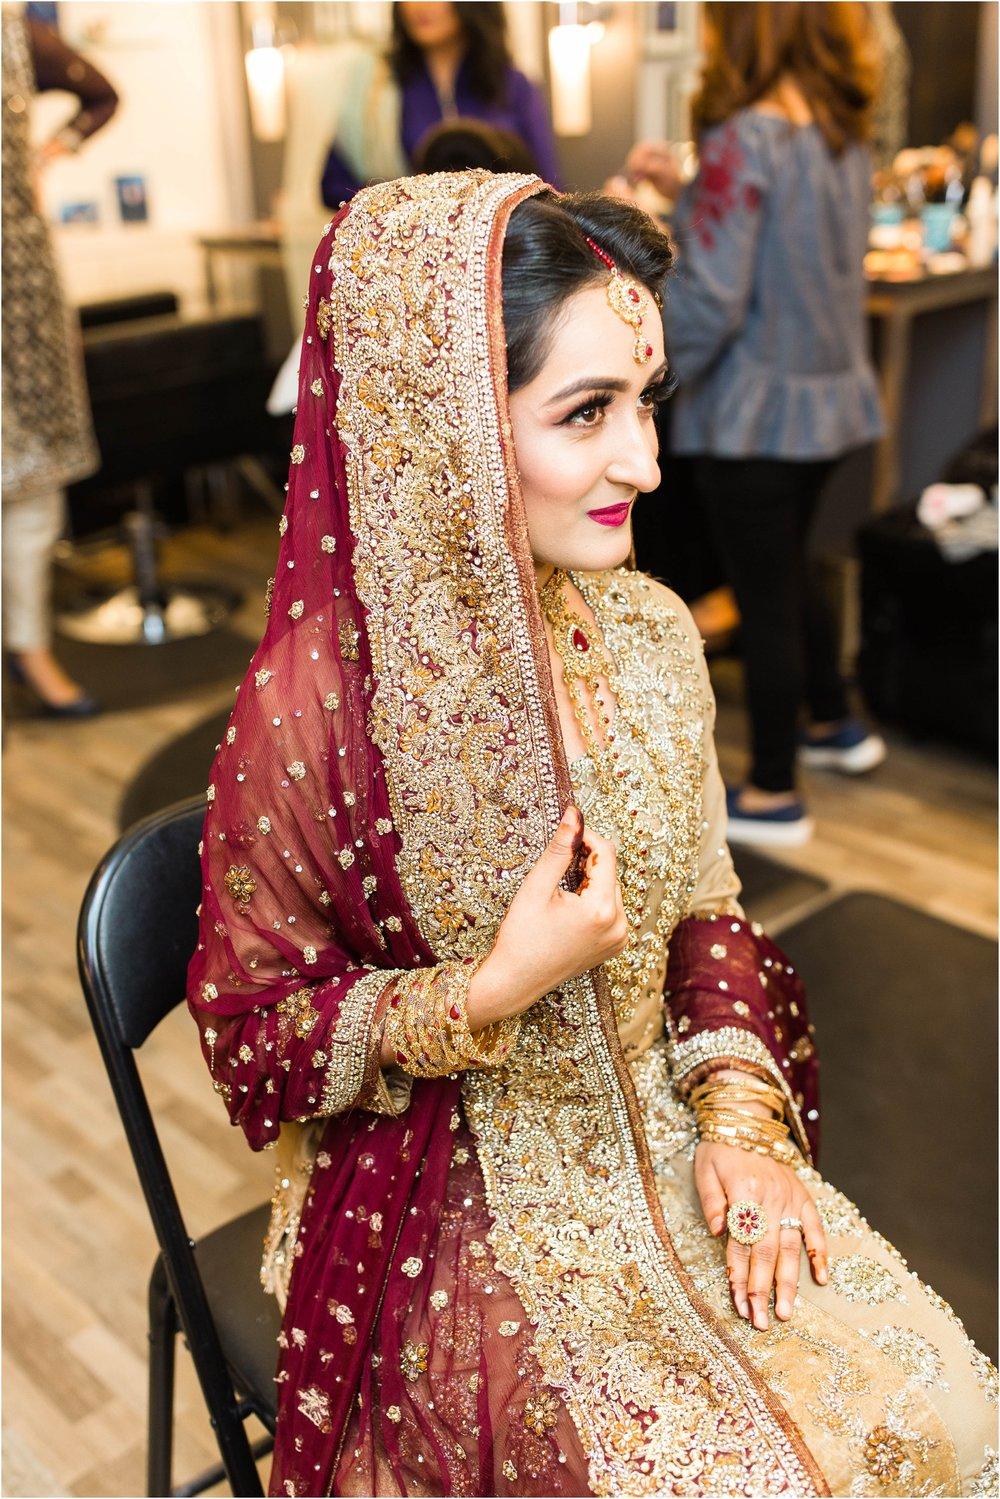 Scarborough-Convention-Centre-Baraat-Toronto-Mississauga-Brampton-Scarborough-GTA-Pakistani-Indian-Wedding-Engagement-Photographer-Photography_0009.jpg